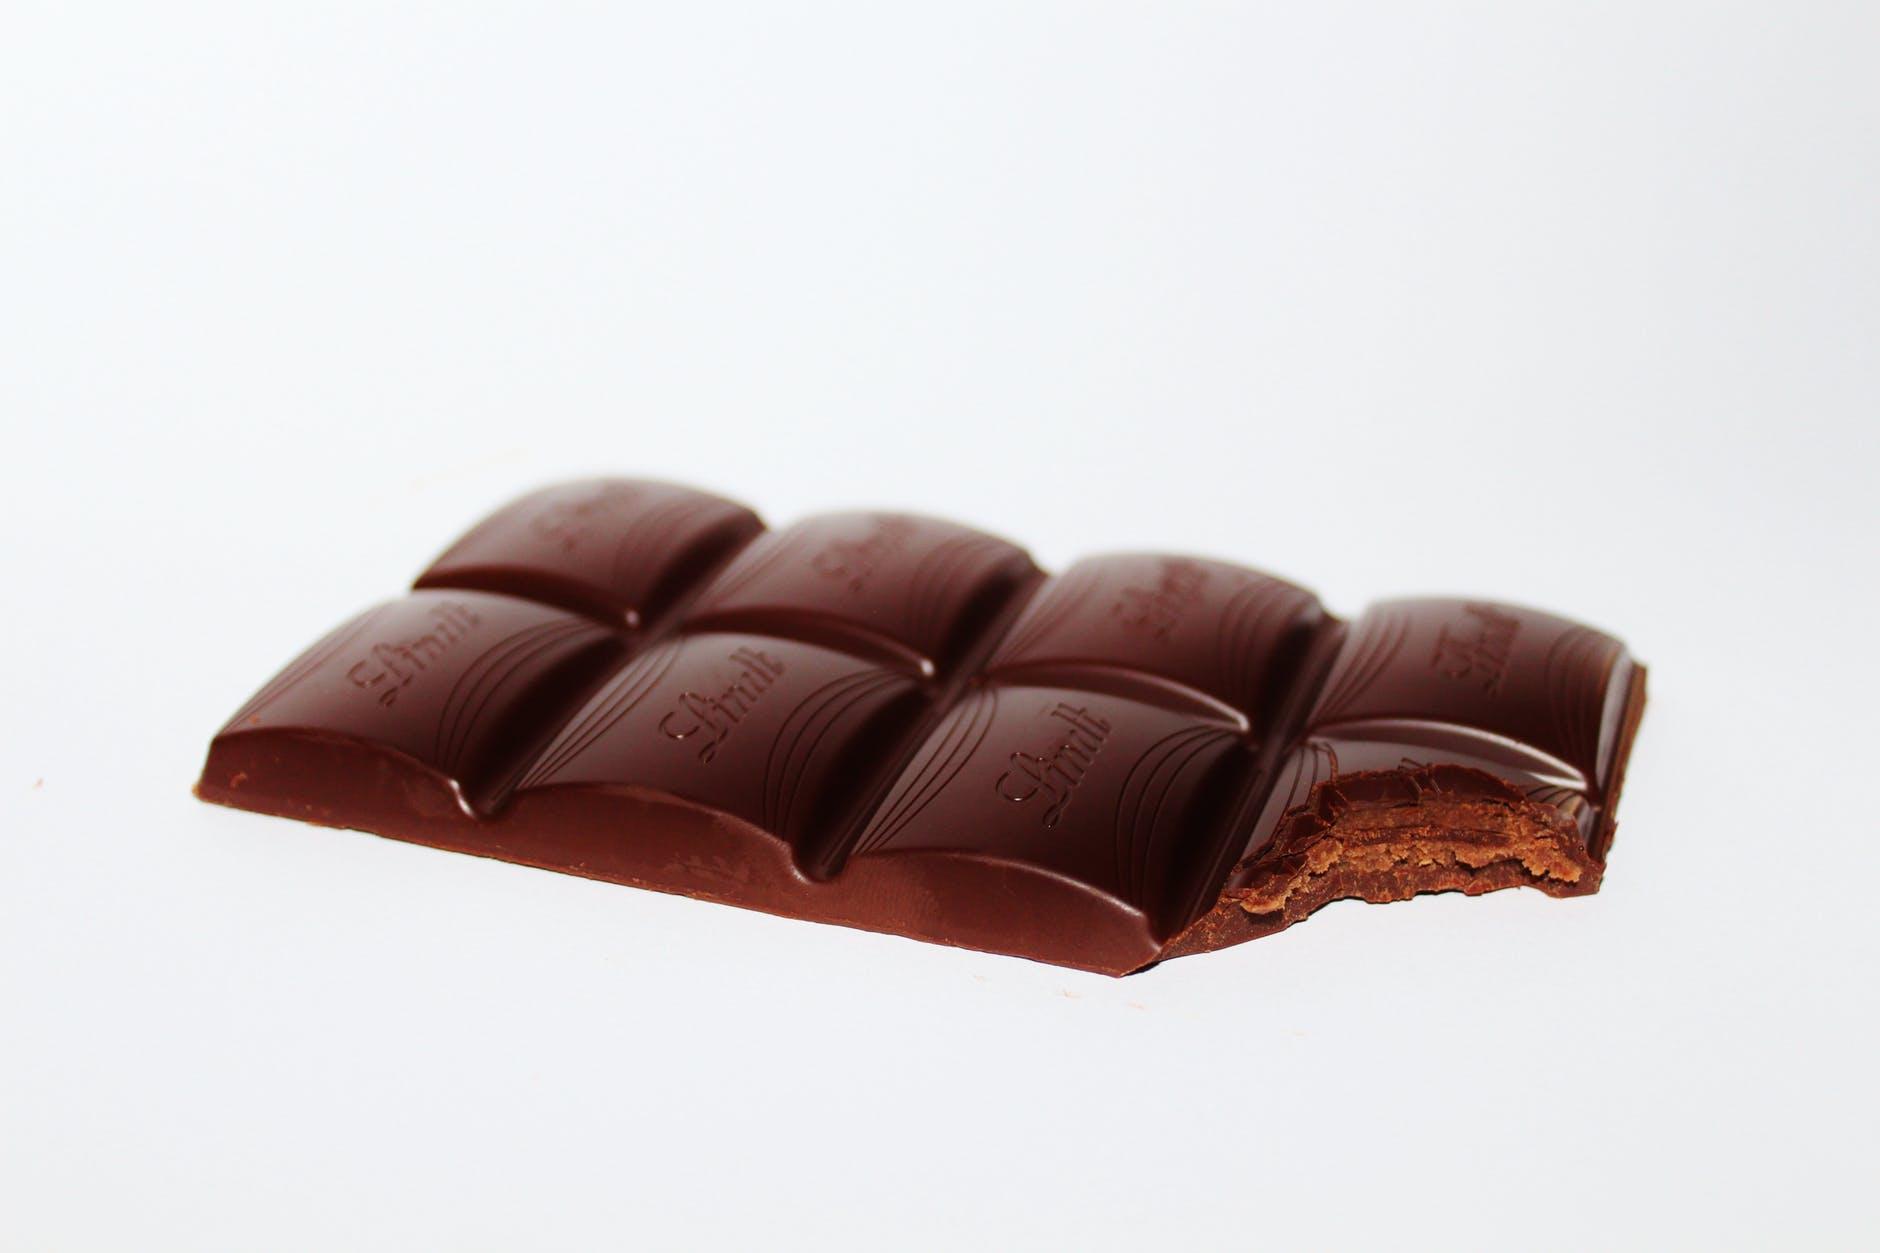 Delicious Swiss milk chocolate